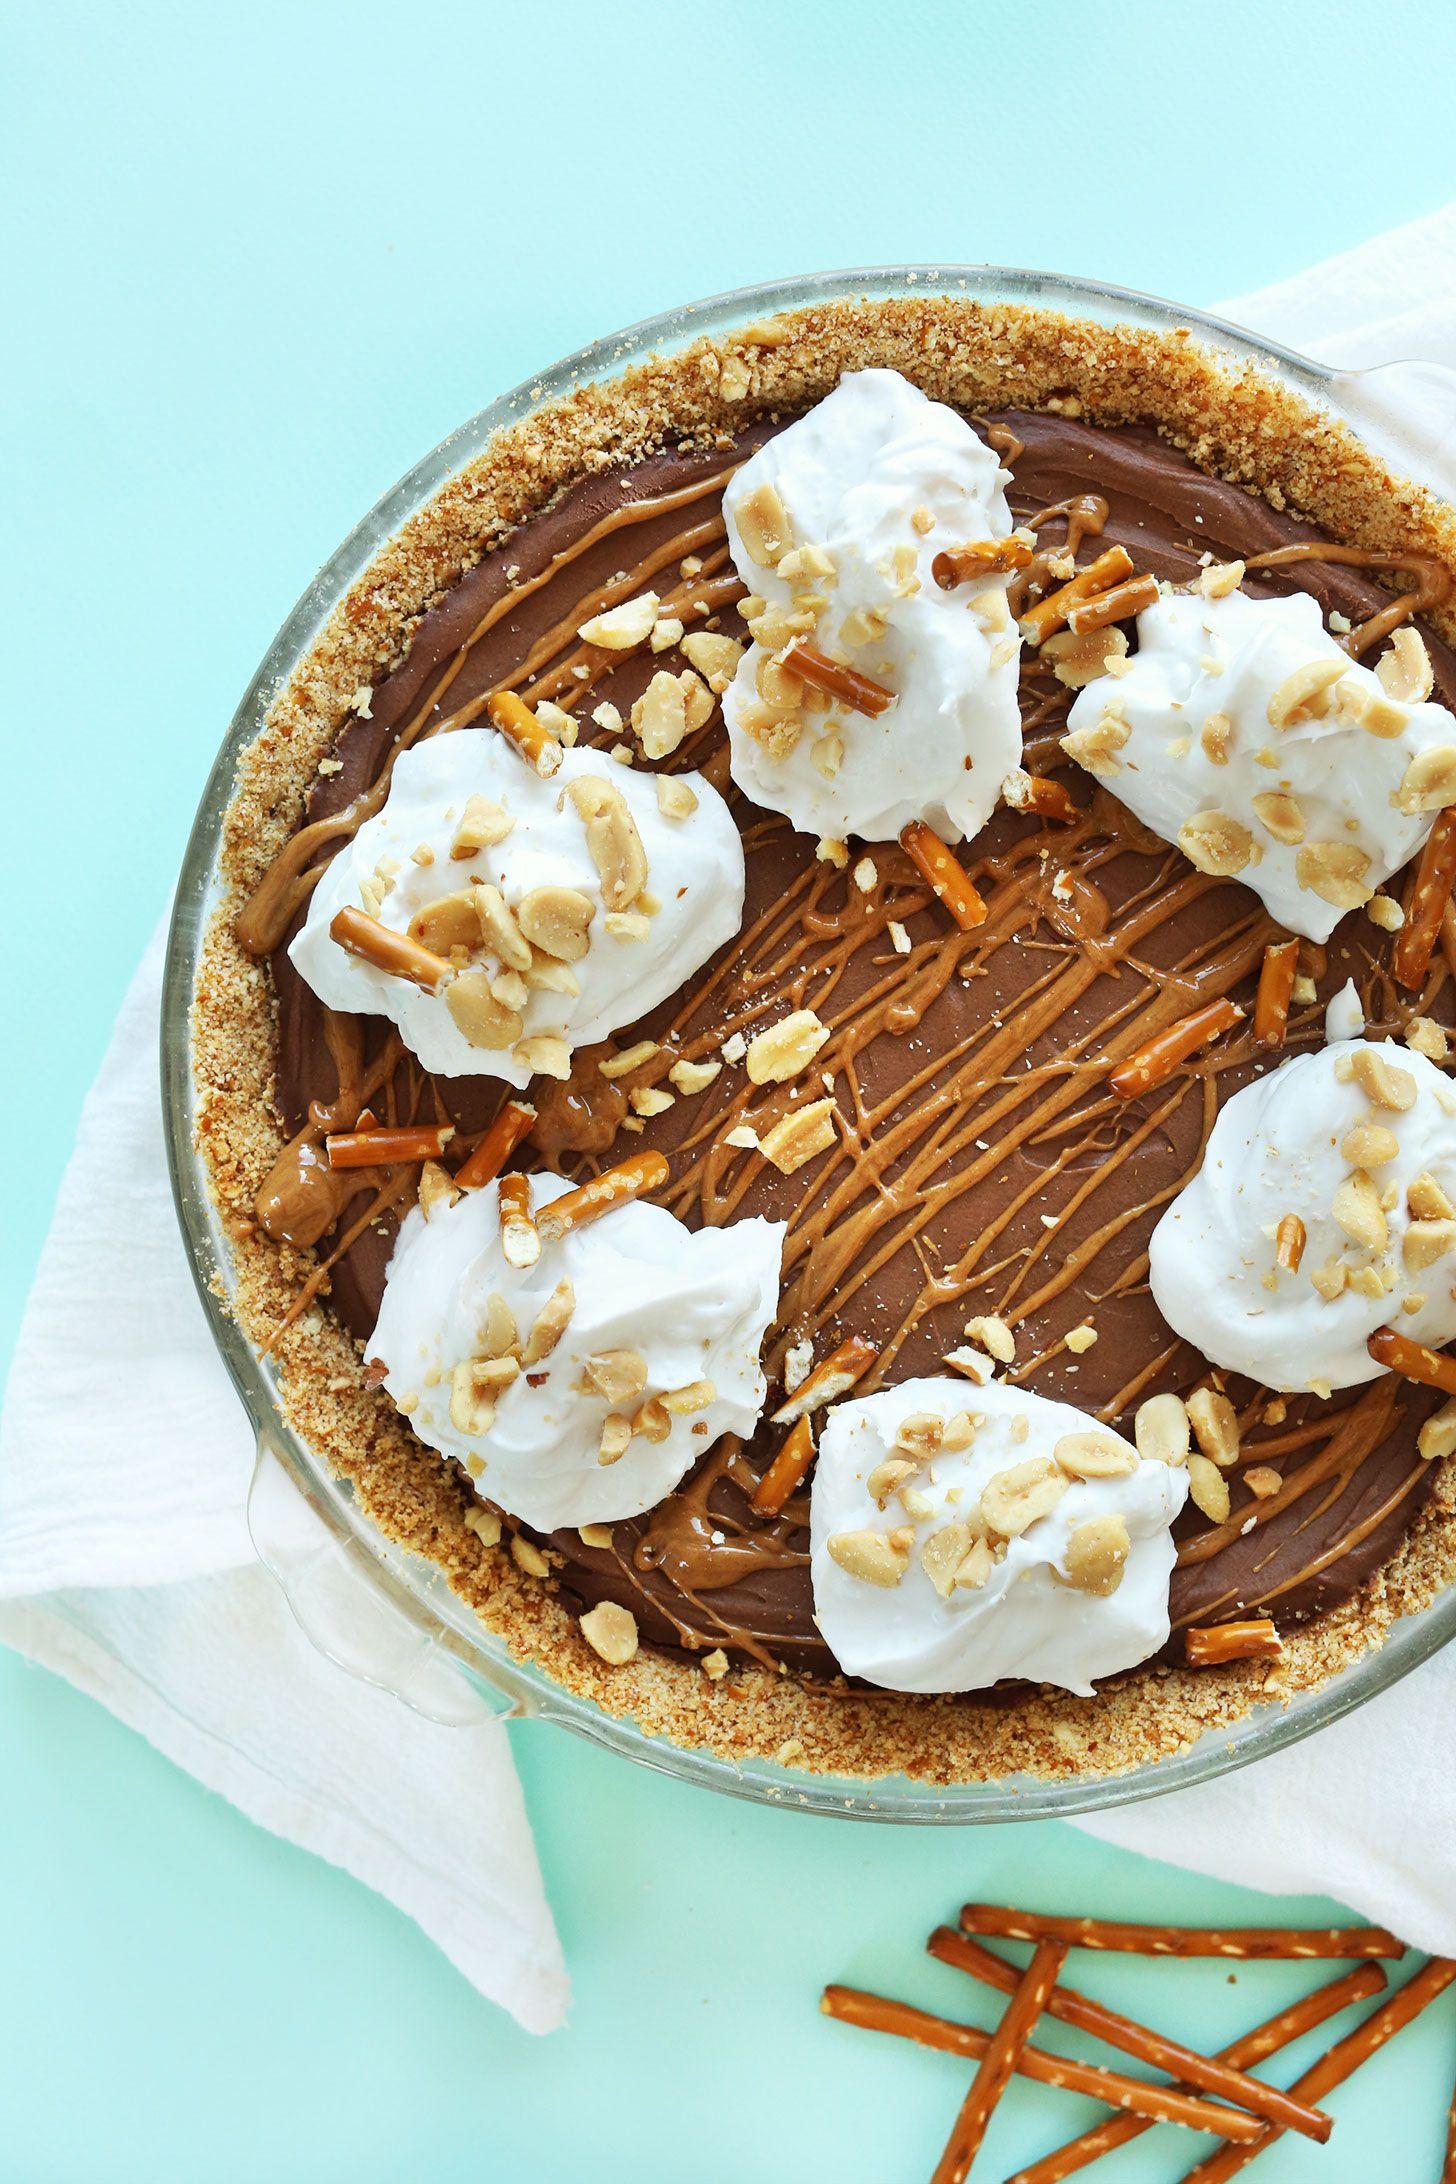 Pretzel Peanut Butter Chocolate Pie Minimalist Baker Recipes Recipe Chocolate Peanut Butter Pie Banana Dessert Recipes Desserts